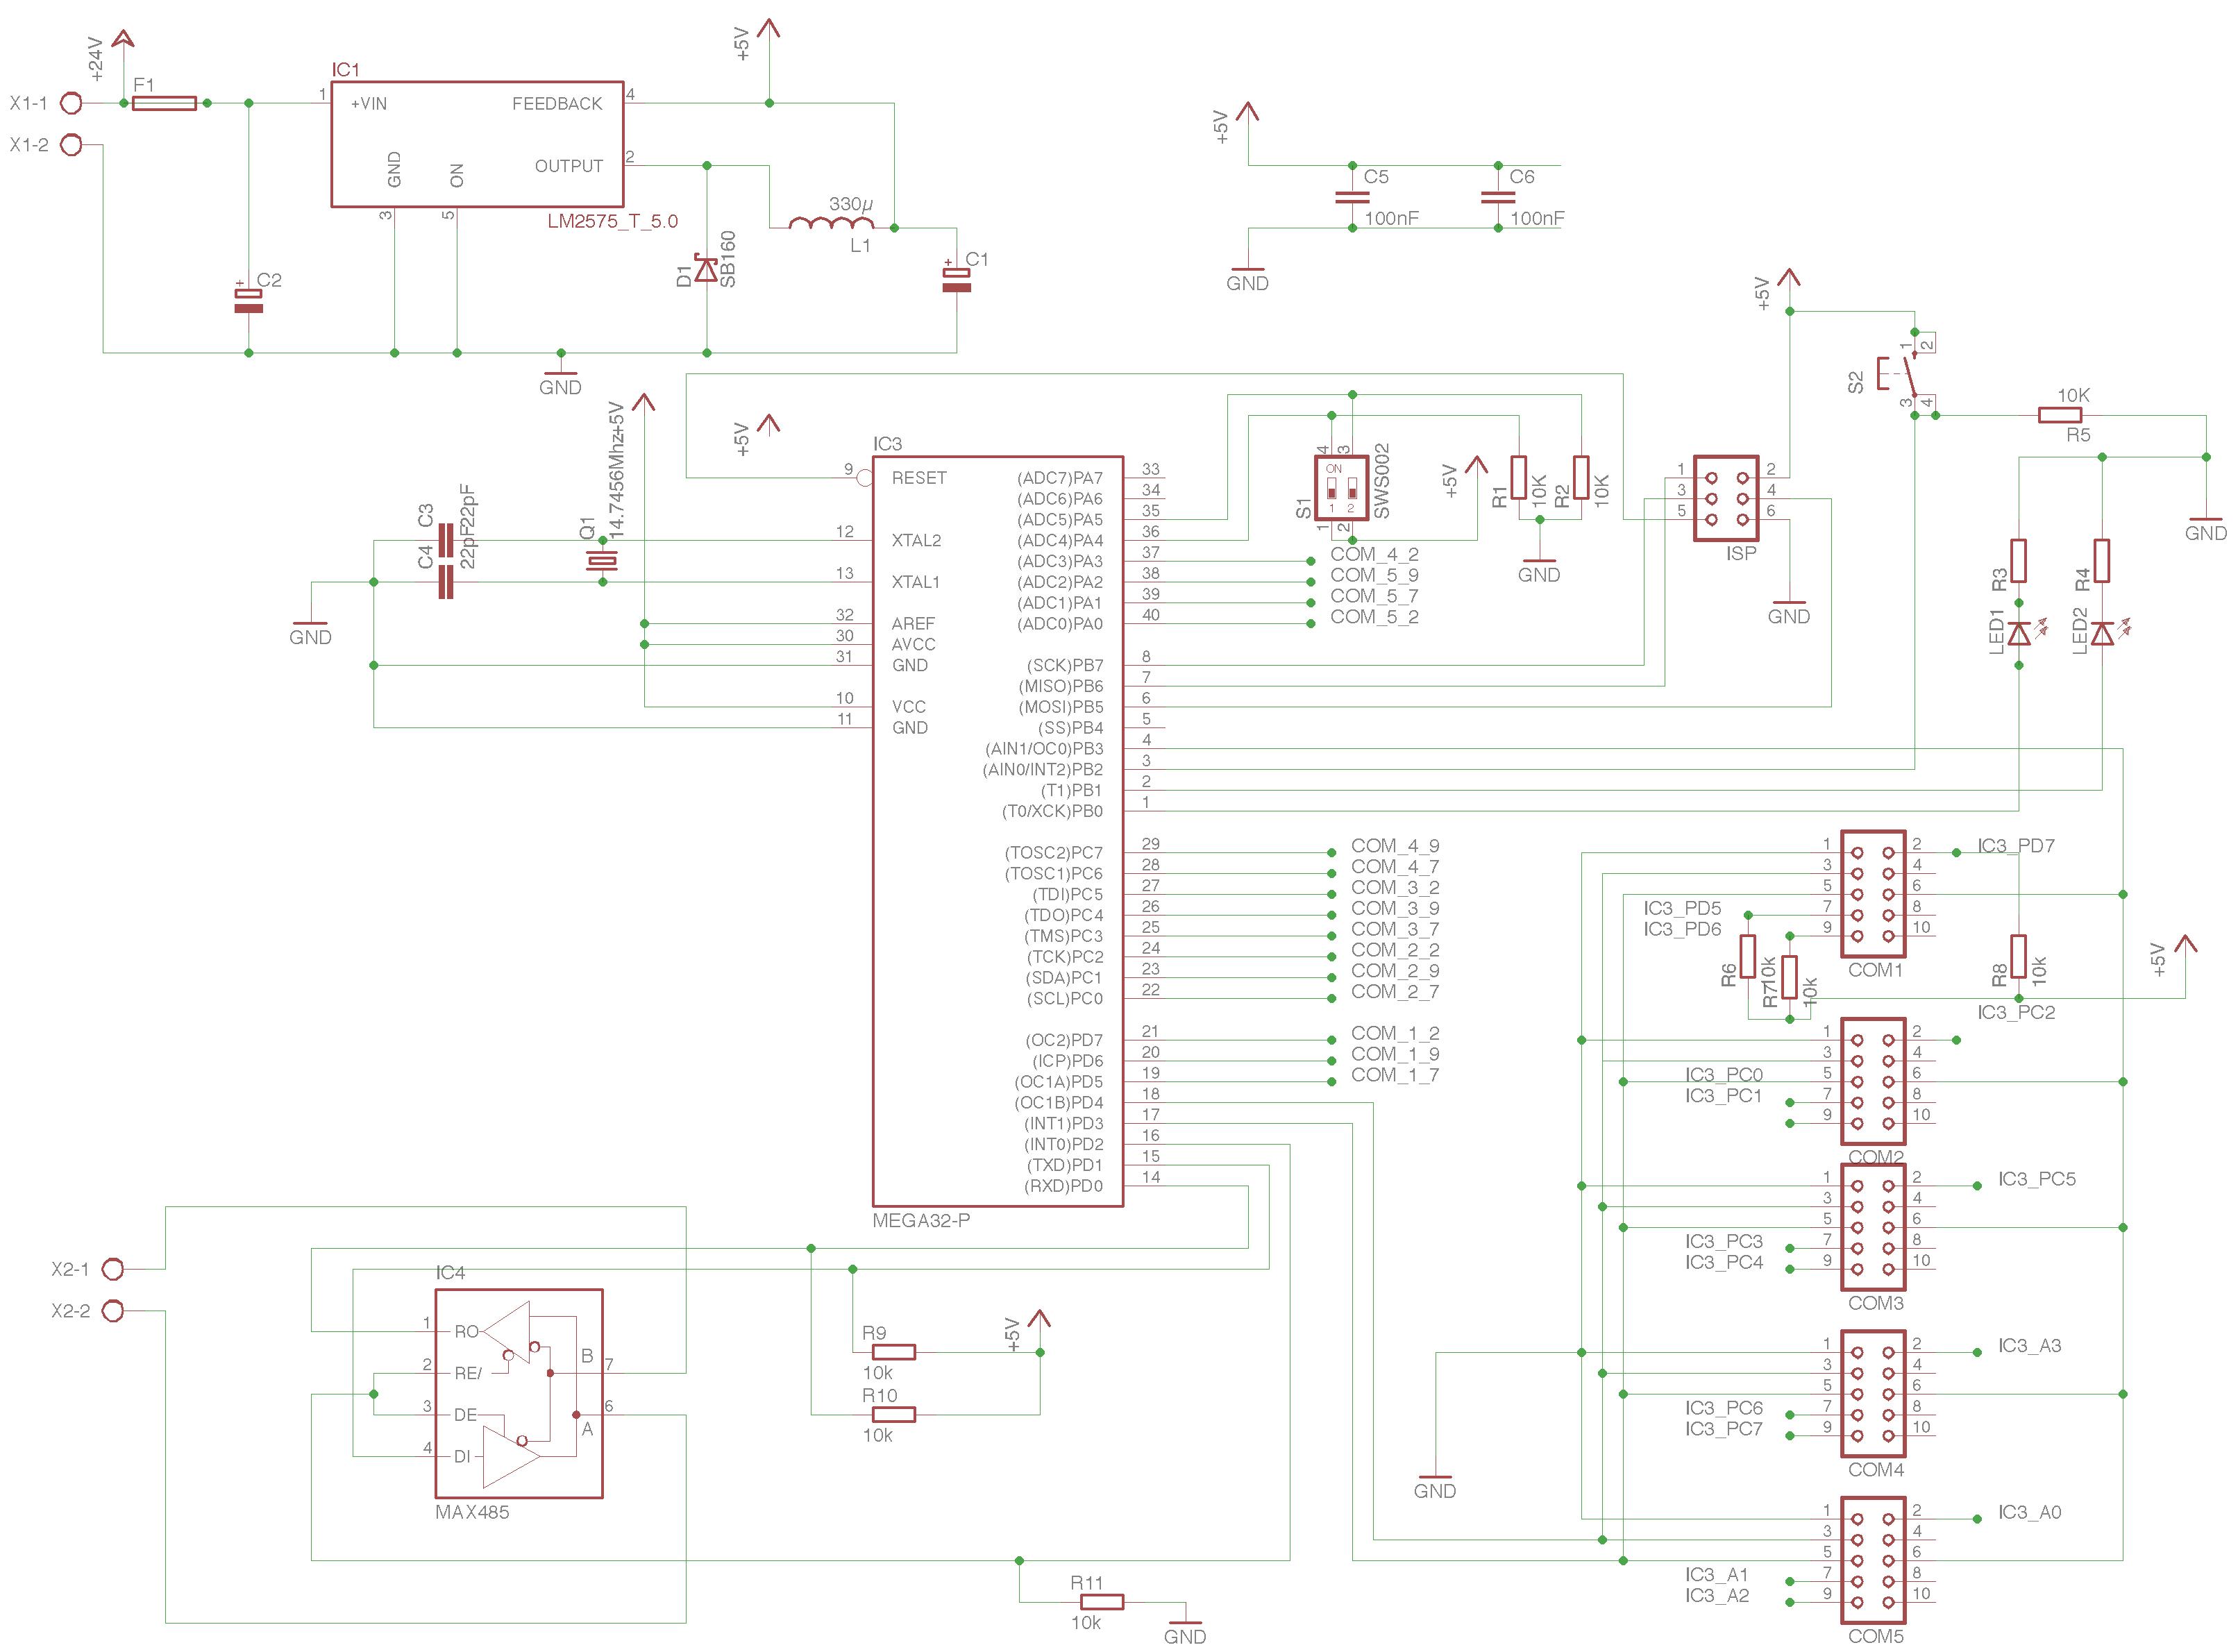 Groß Automatische Stereo Verkabelung Ideen - Schaltplan Serie ...